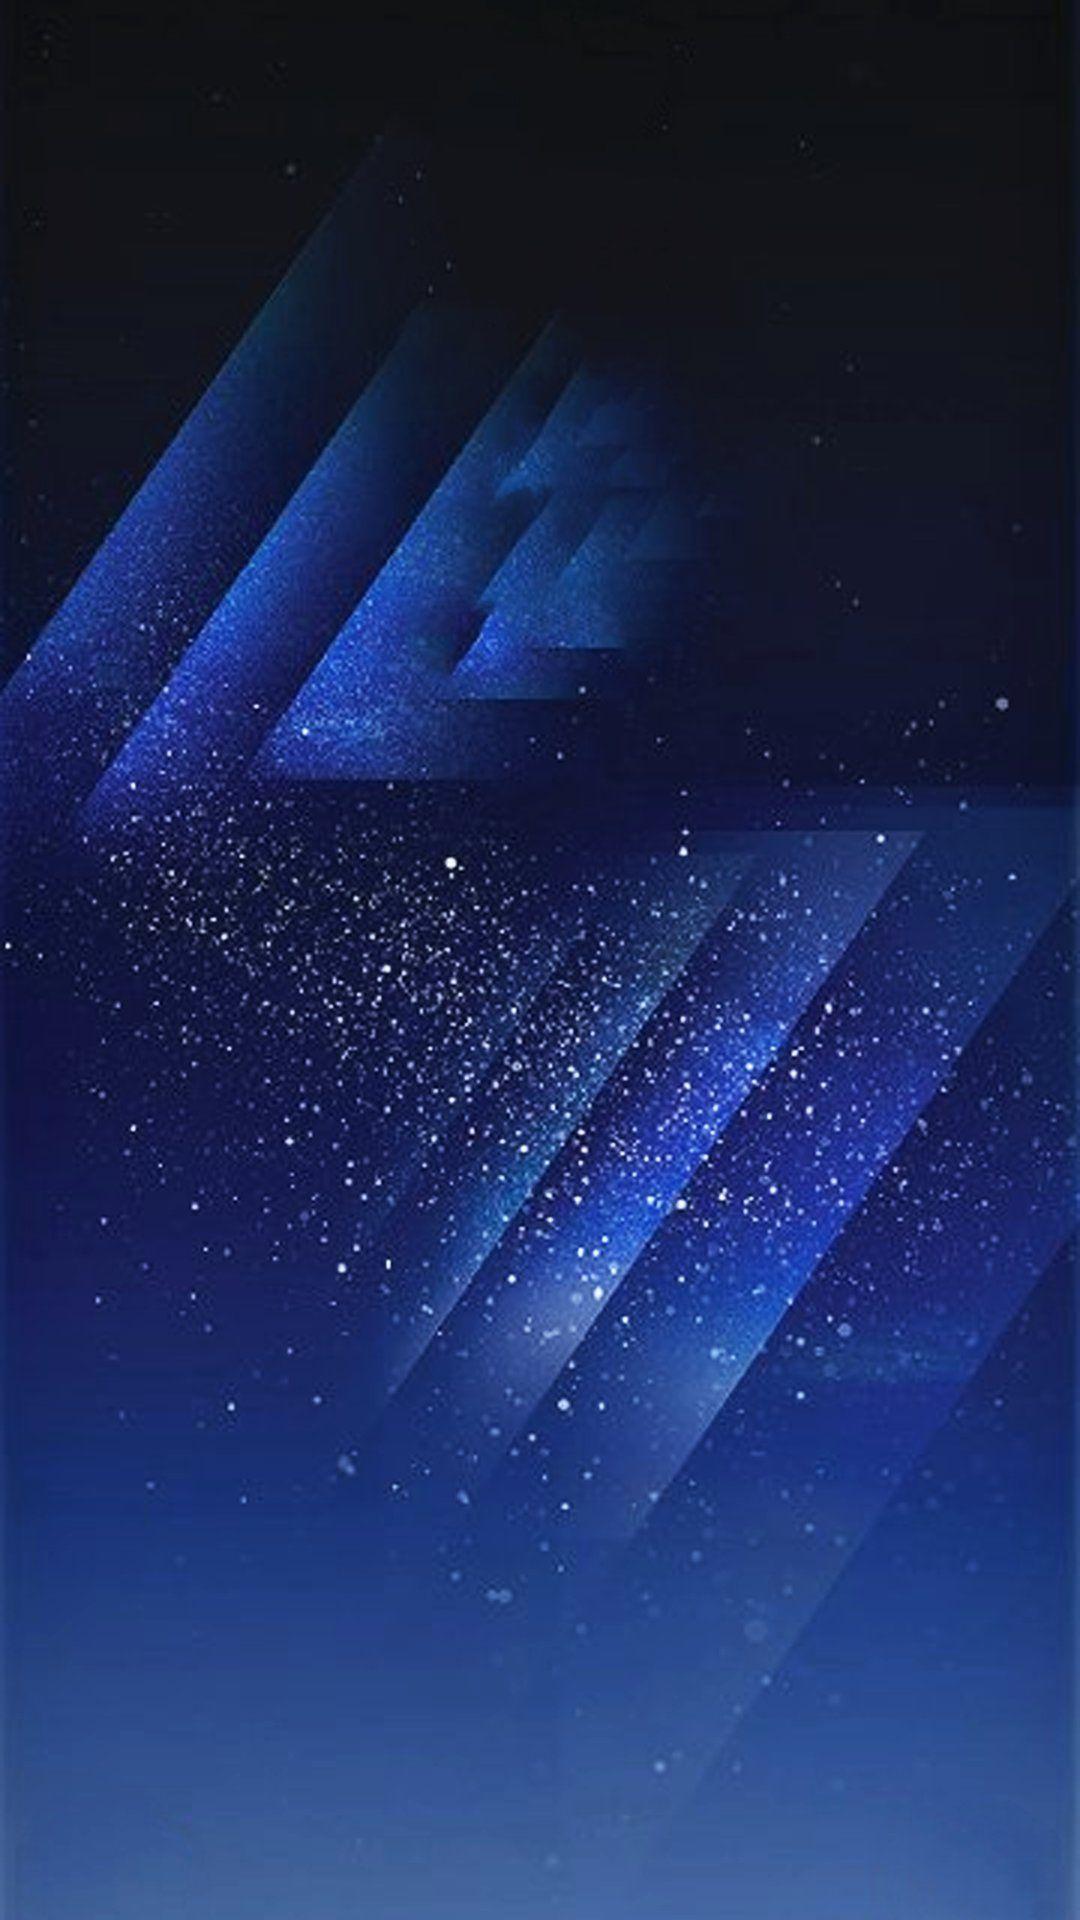 Hd Lock Screen Wallpaper Android